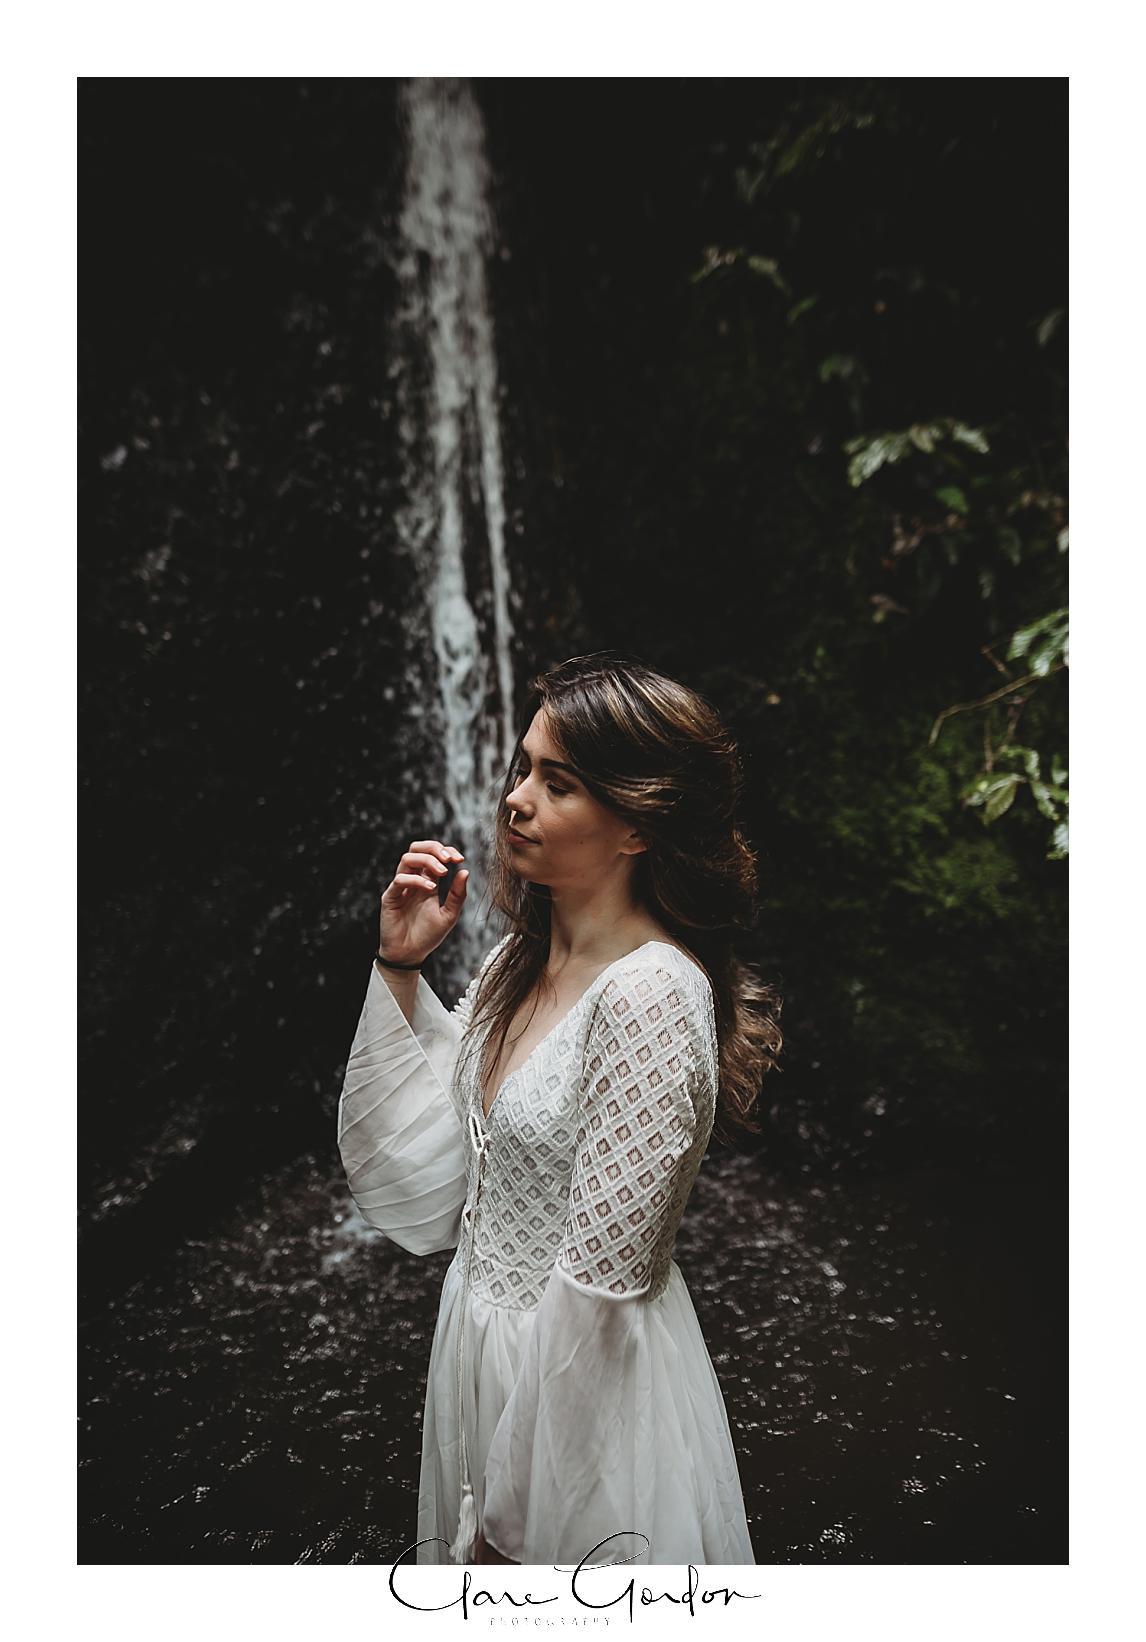 boho-bride-Shoot-Waikato-Wedding-photography-Girl-in Waterfall -New Zealand-wedding (4).jpg